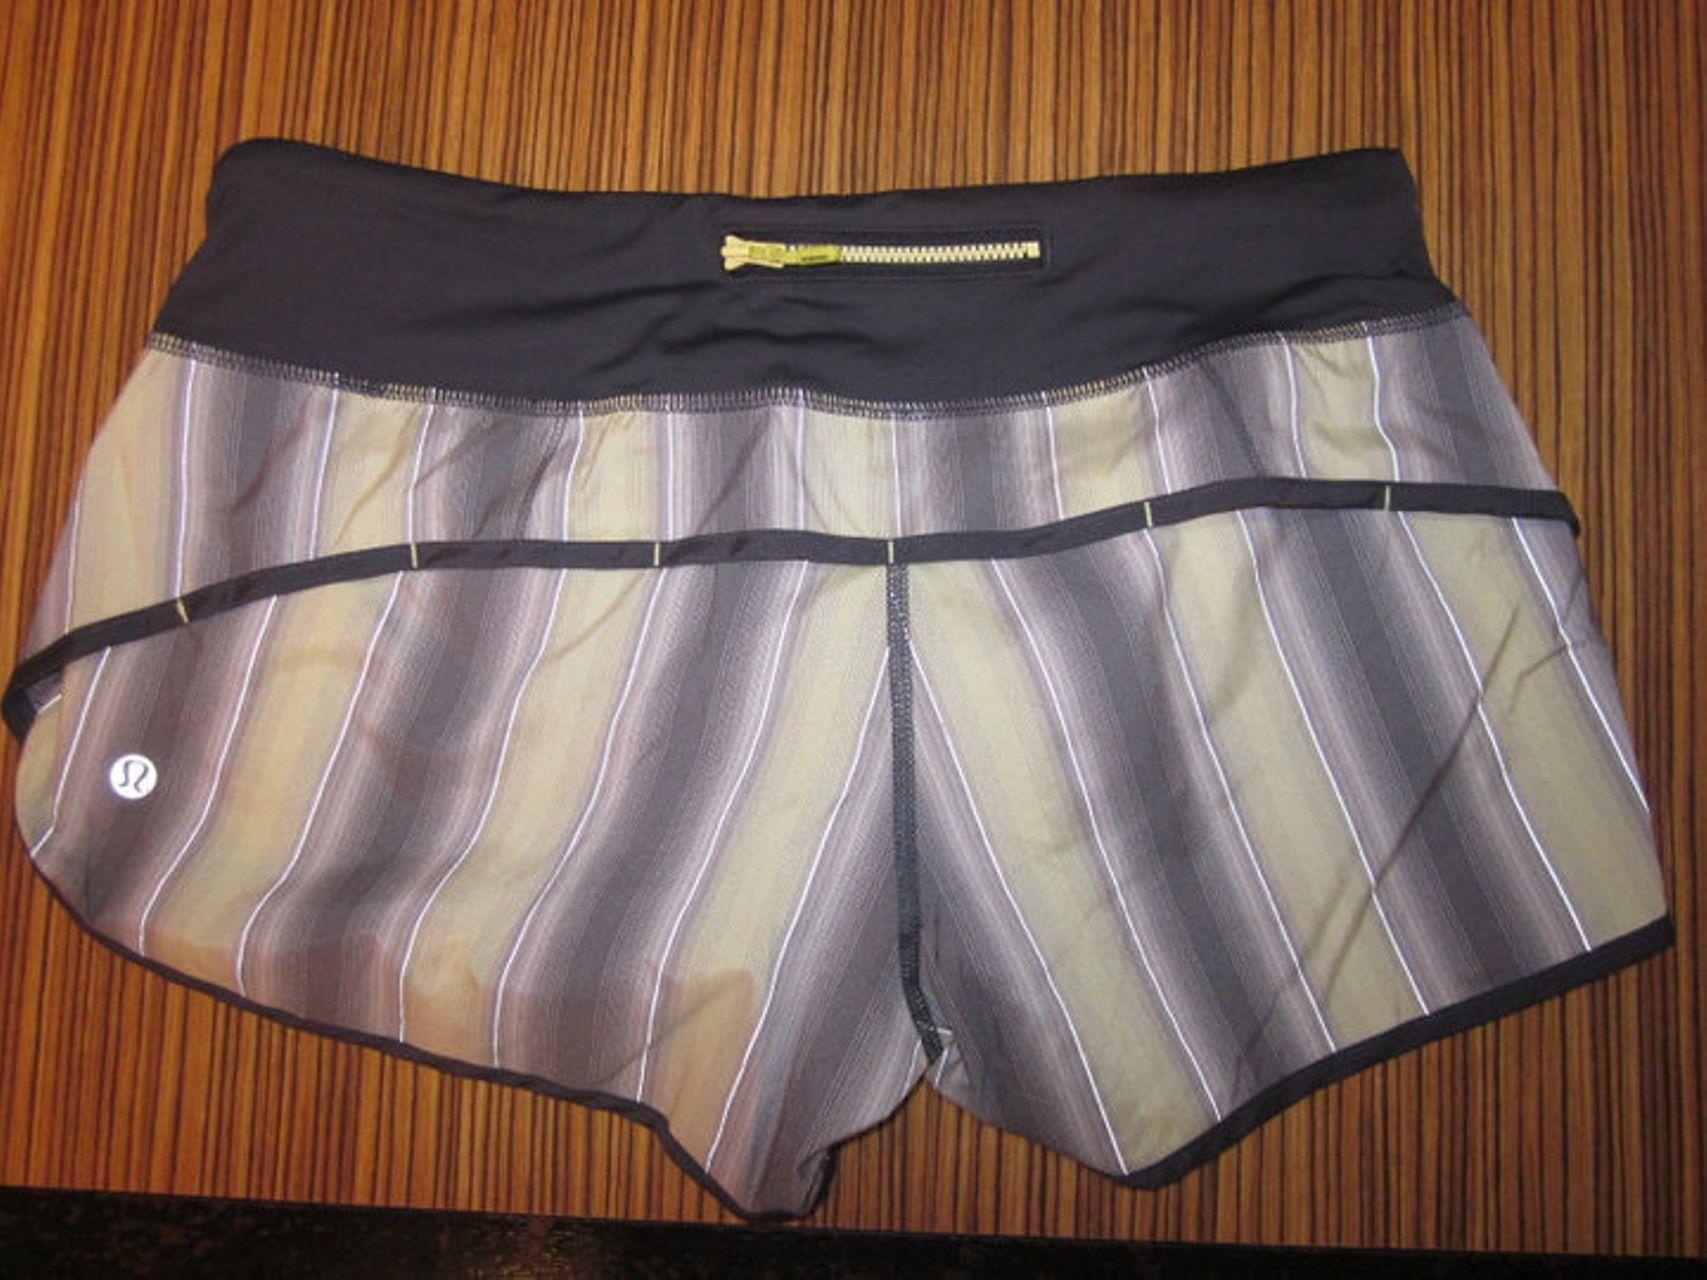 Lululemon Speed Short - Coal Citron Ombre (vertical stripes)